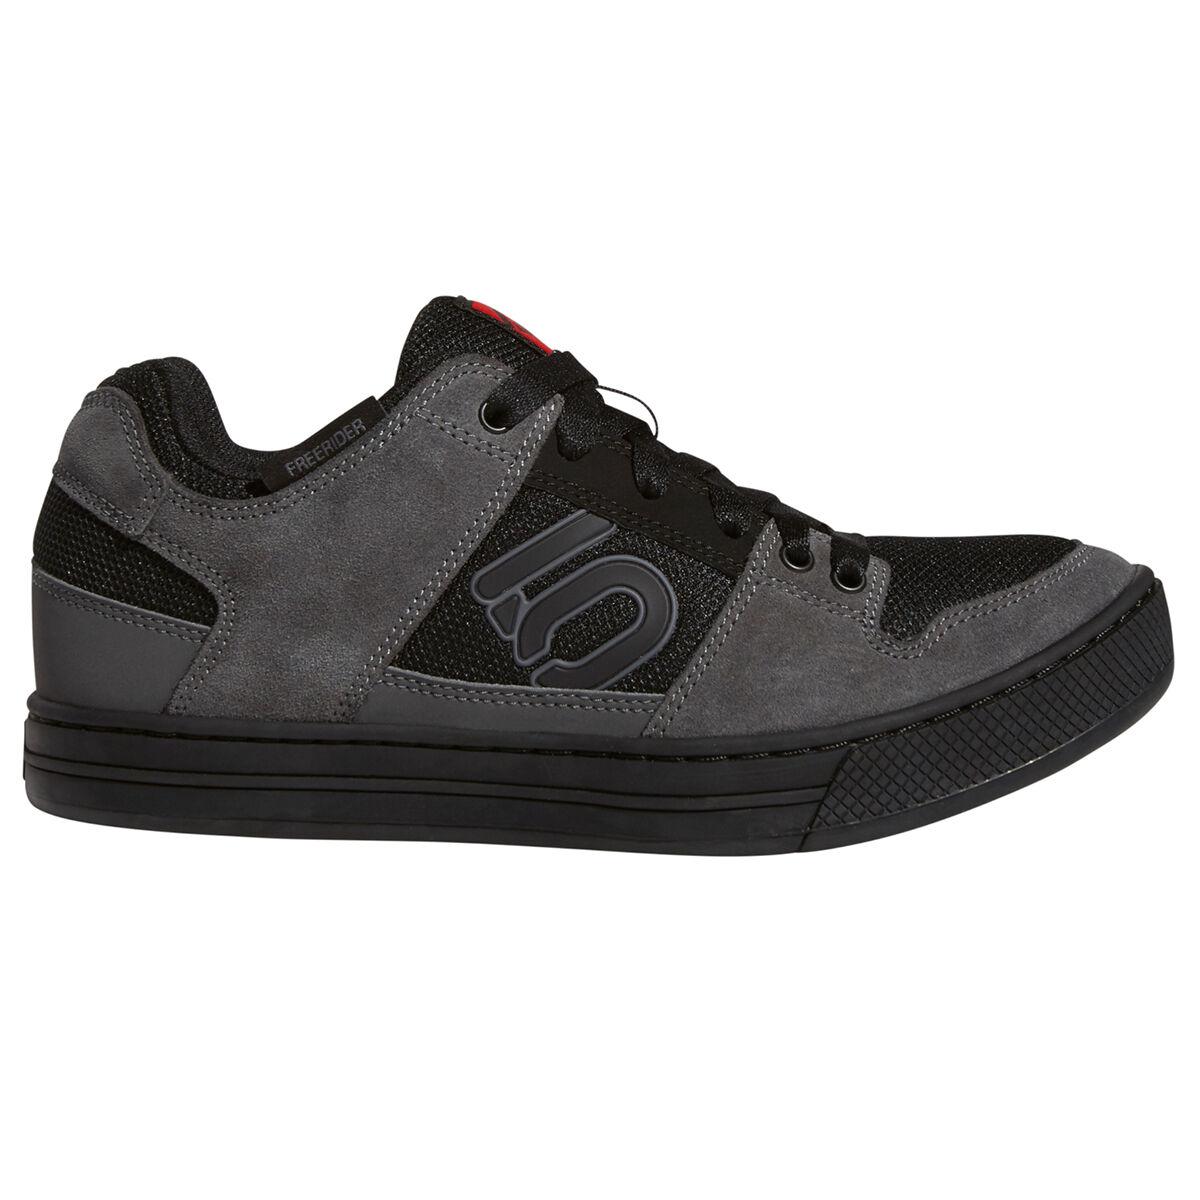 FIVE.TEN Five. ten Men's Freerider Mountain Bike Shoes - Size 12.5